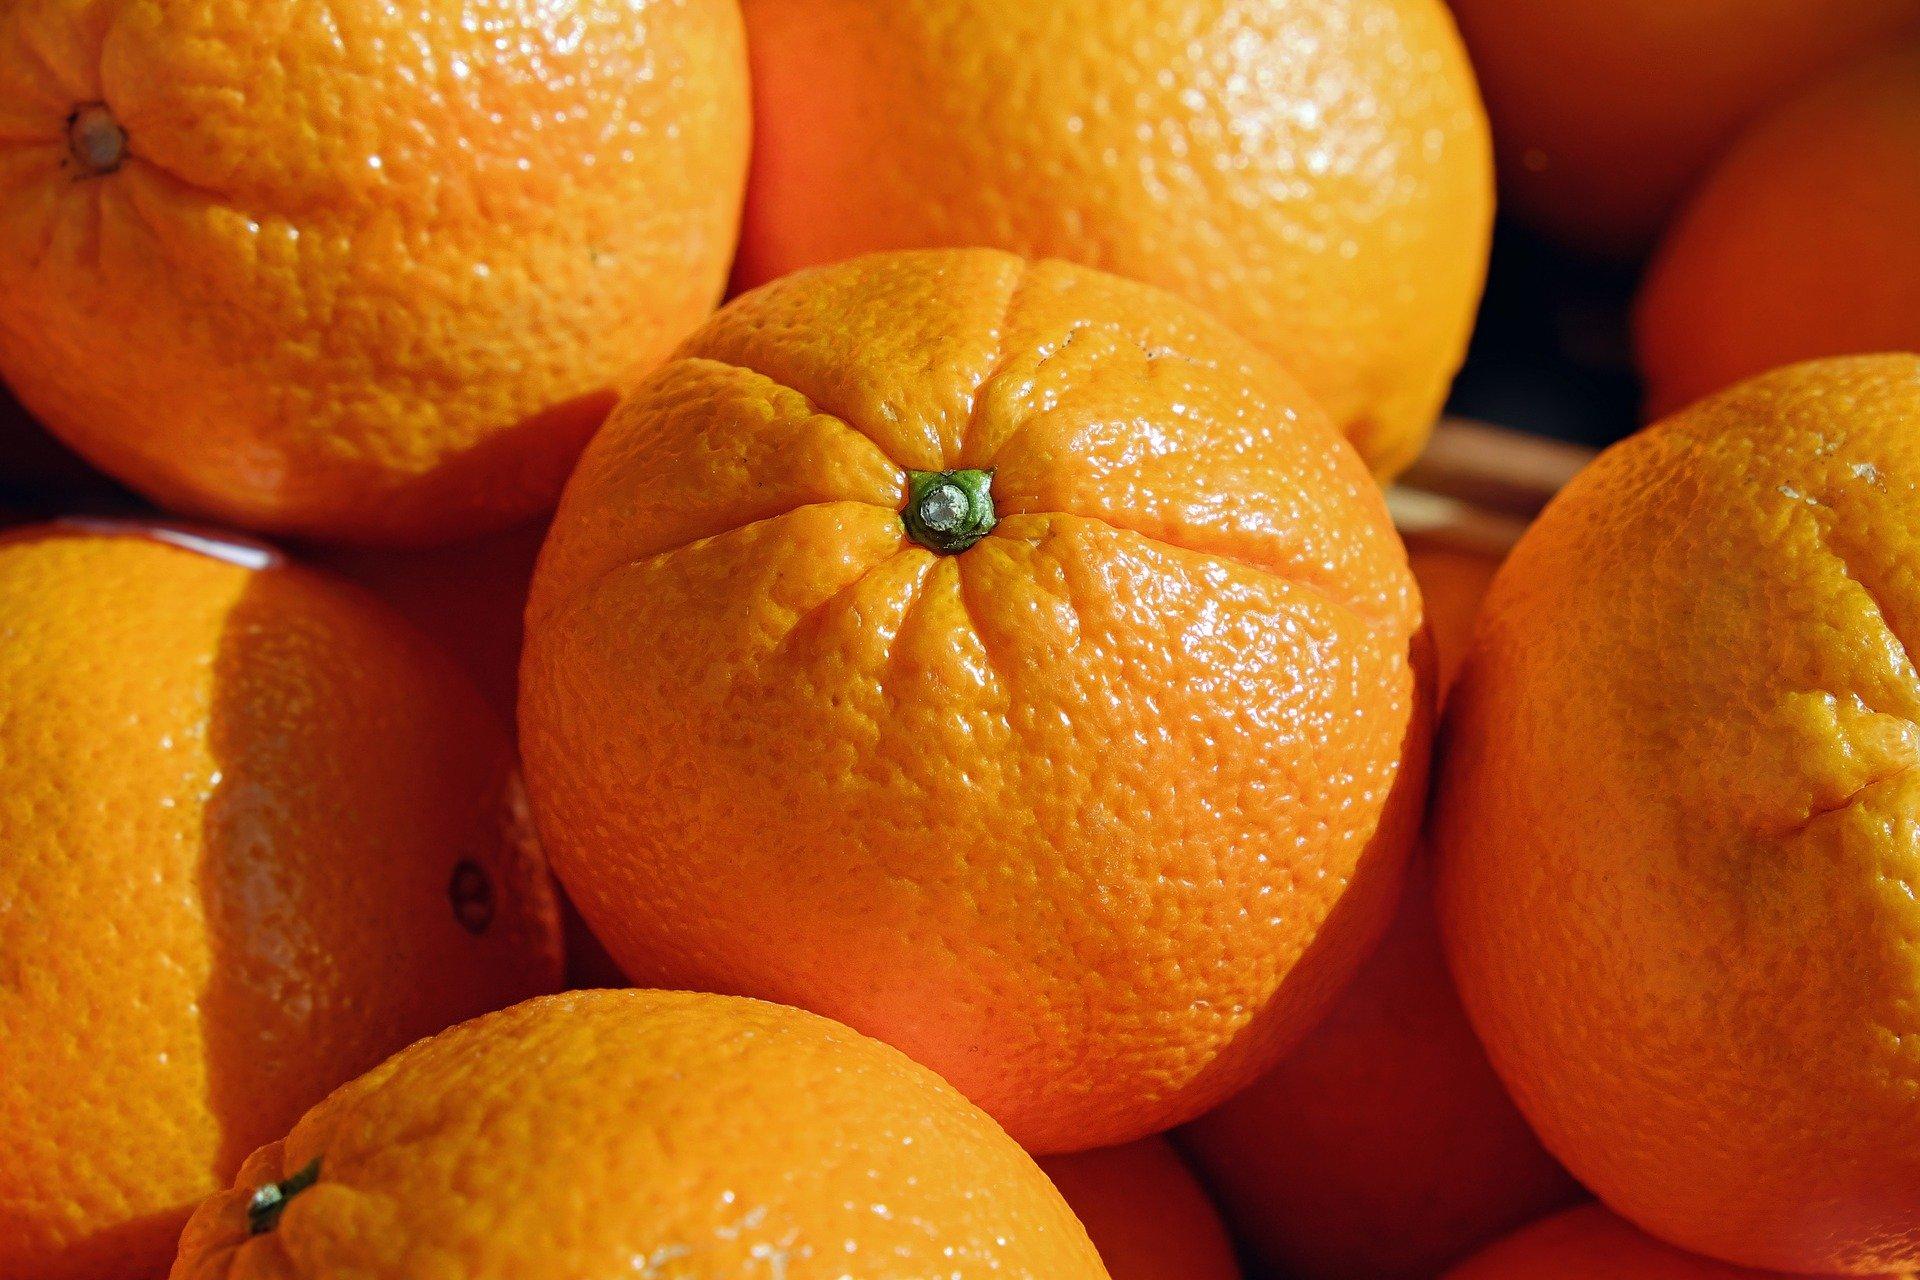 Süß statt bitter – Kirchenaktion bringt 14 Tonnen öko-faire Orangen nach Westfalen